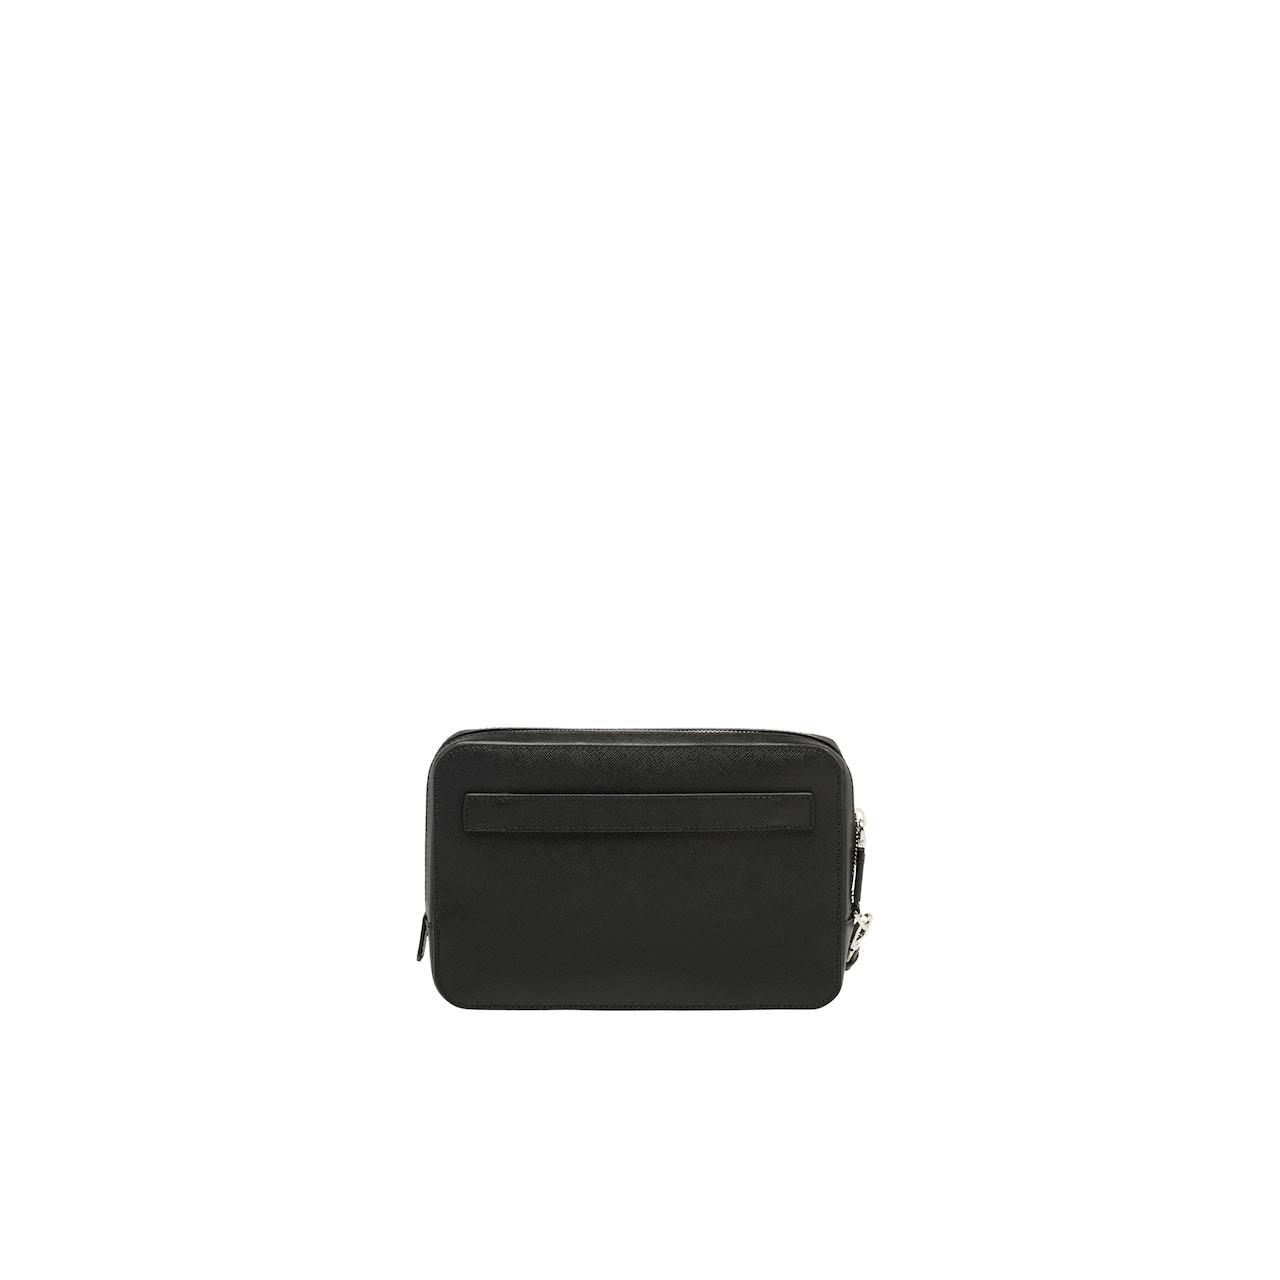 Saffiano leather case